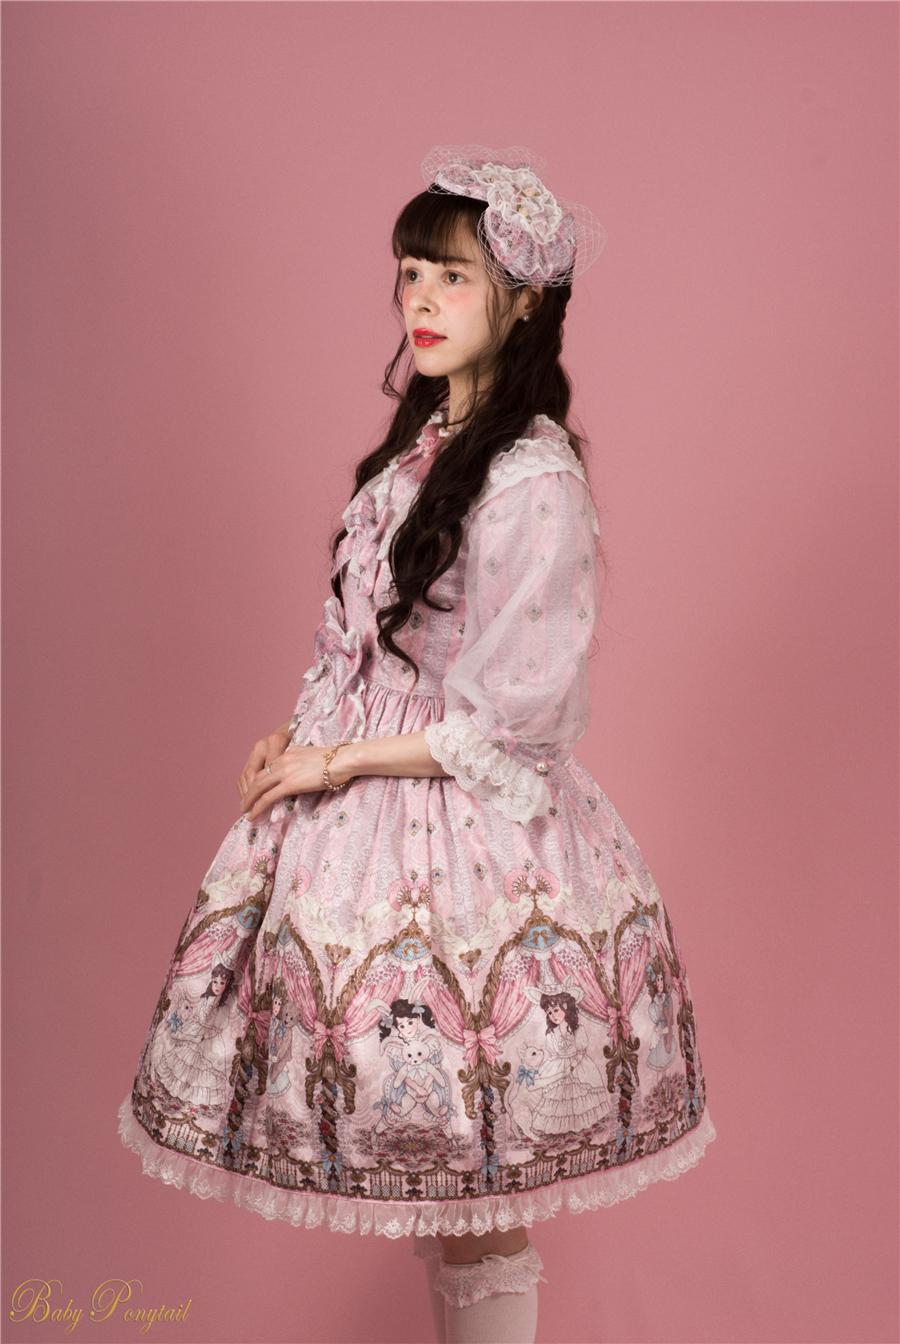 BabyPonytail_Model Photo_My Favorite Companion_OP Pink_1.jpg